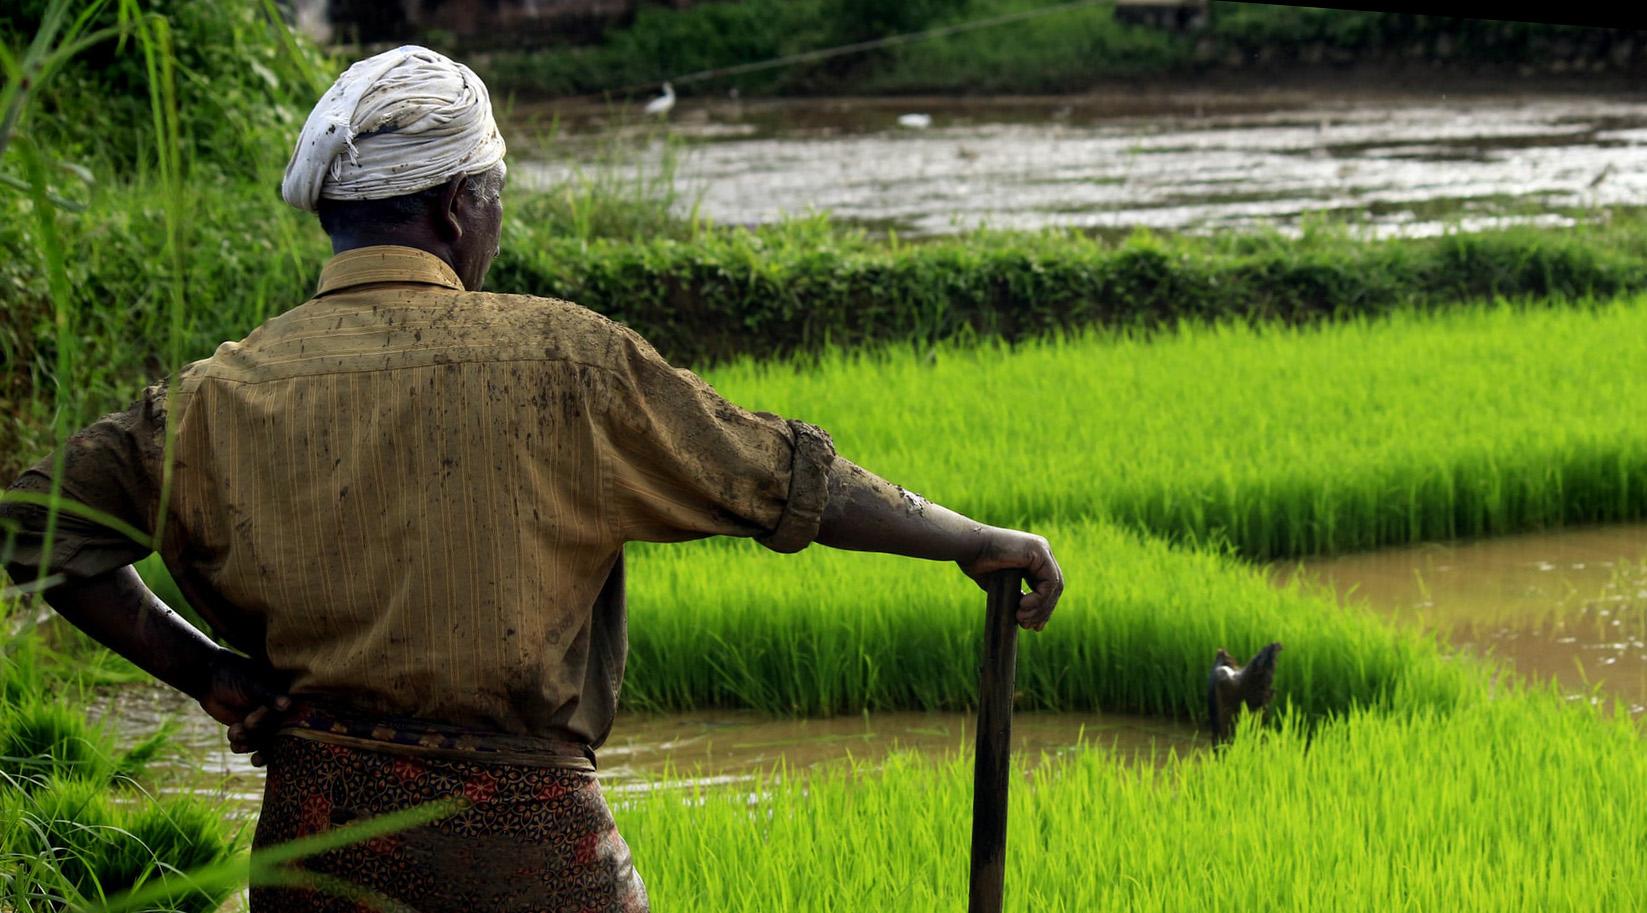 indianfarmer.jpg